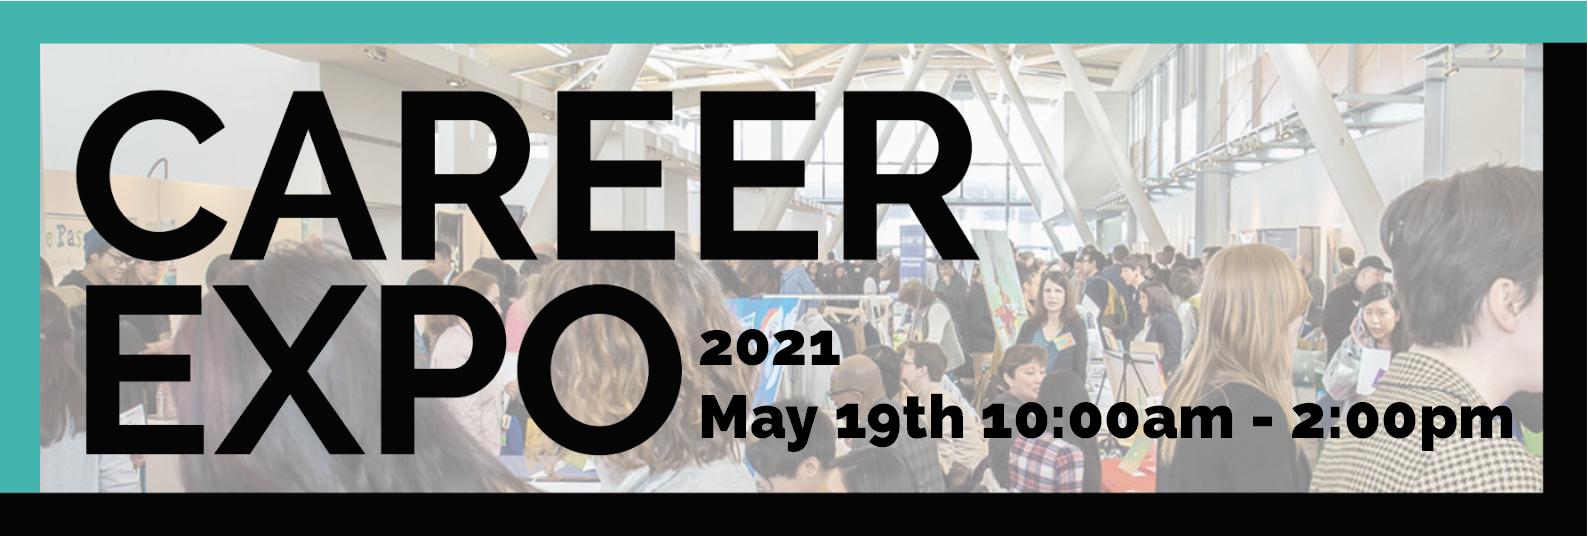 Career Expo 2021: May 19th on Handshake!